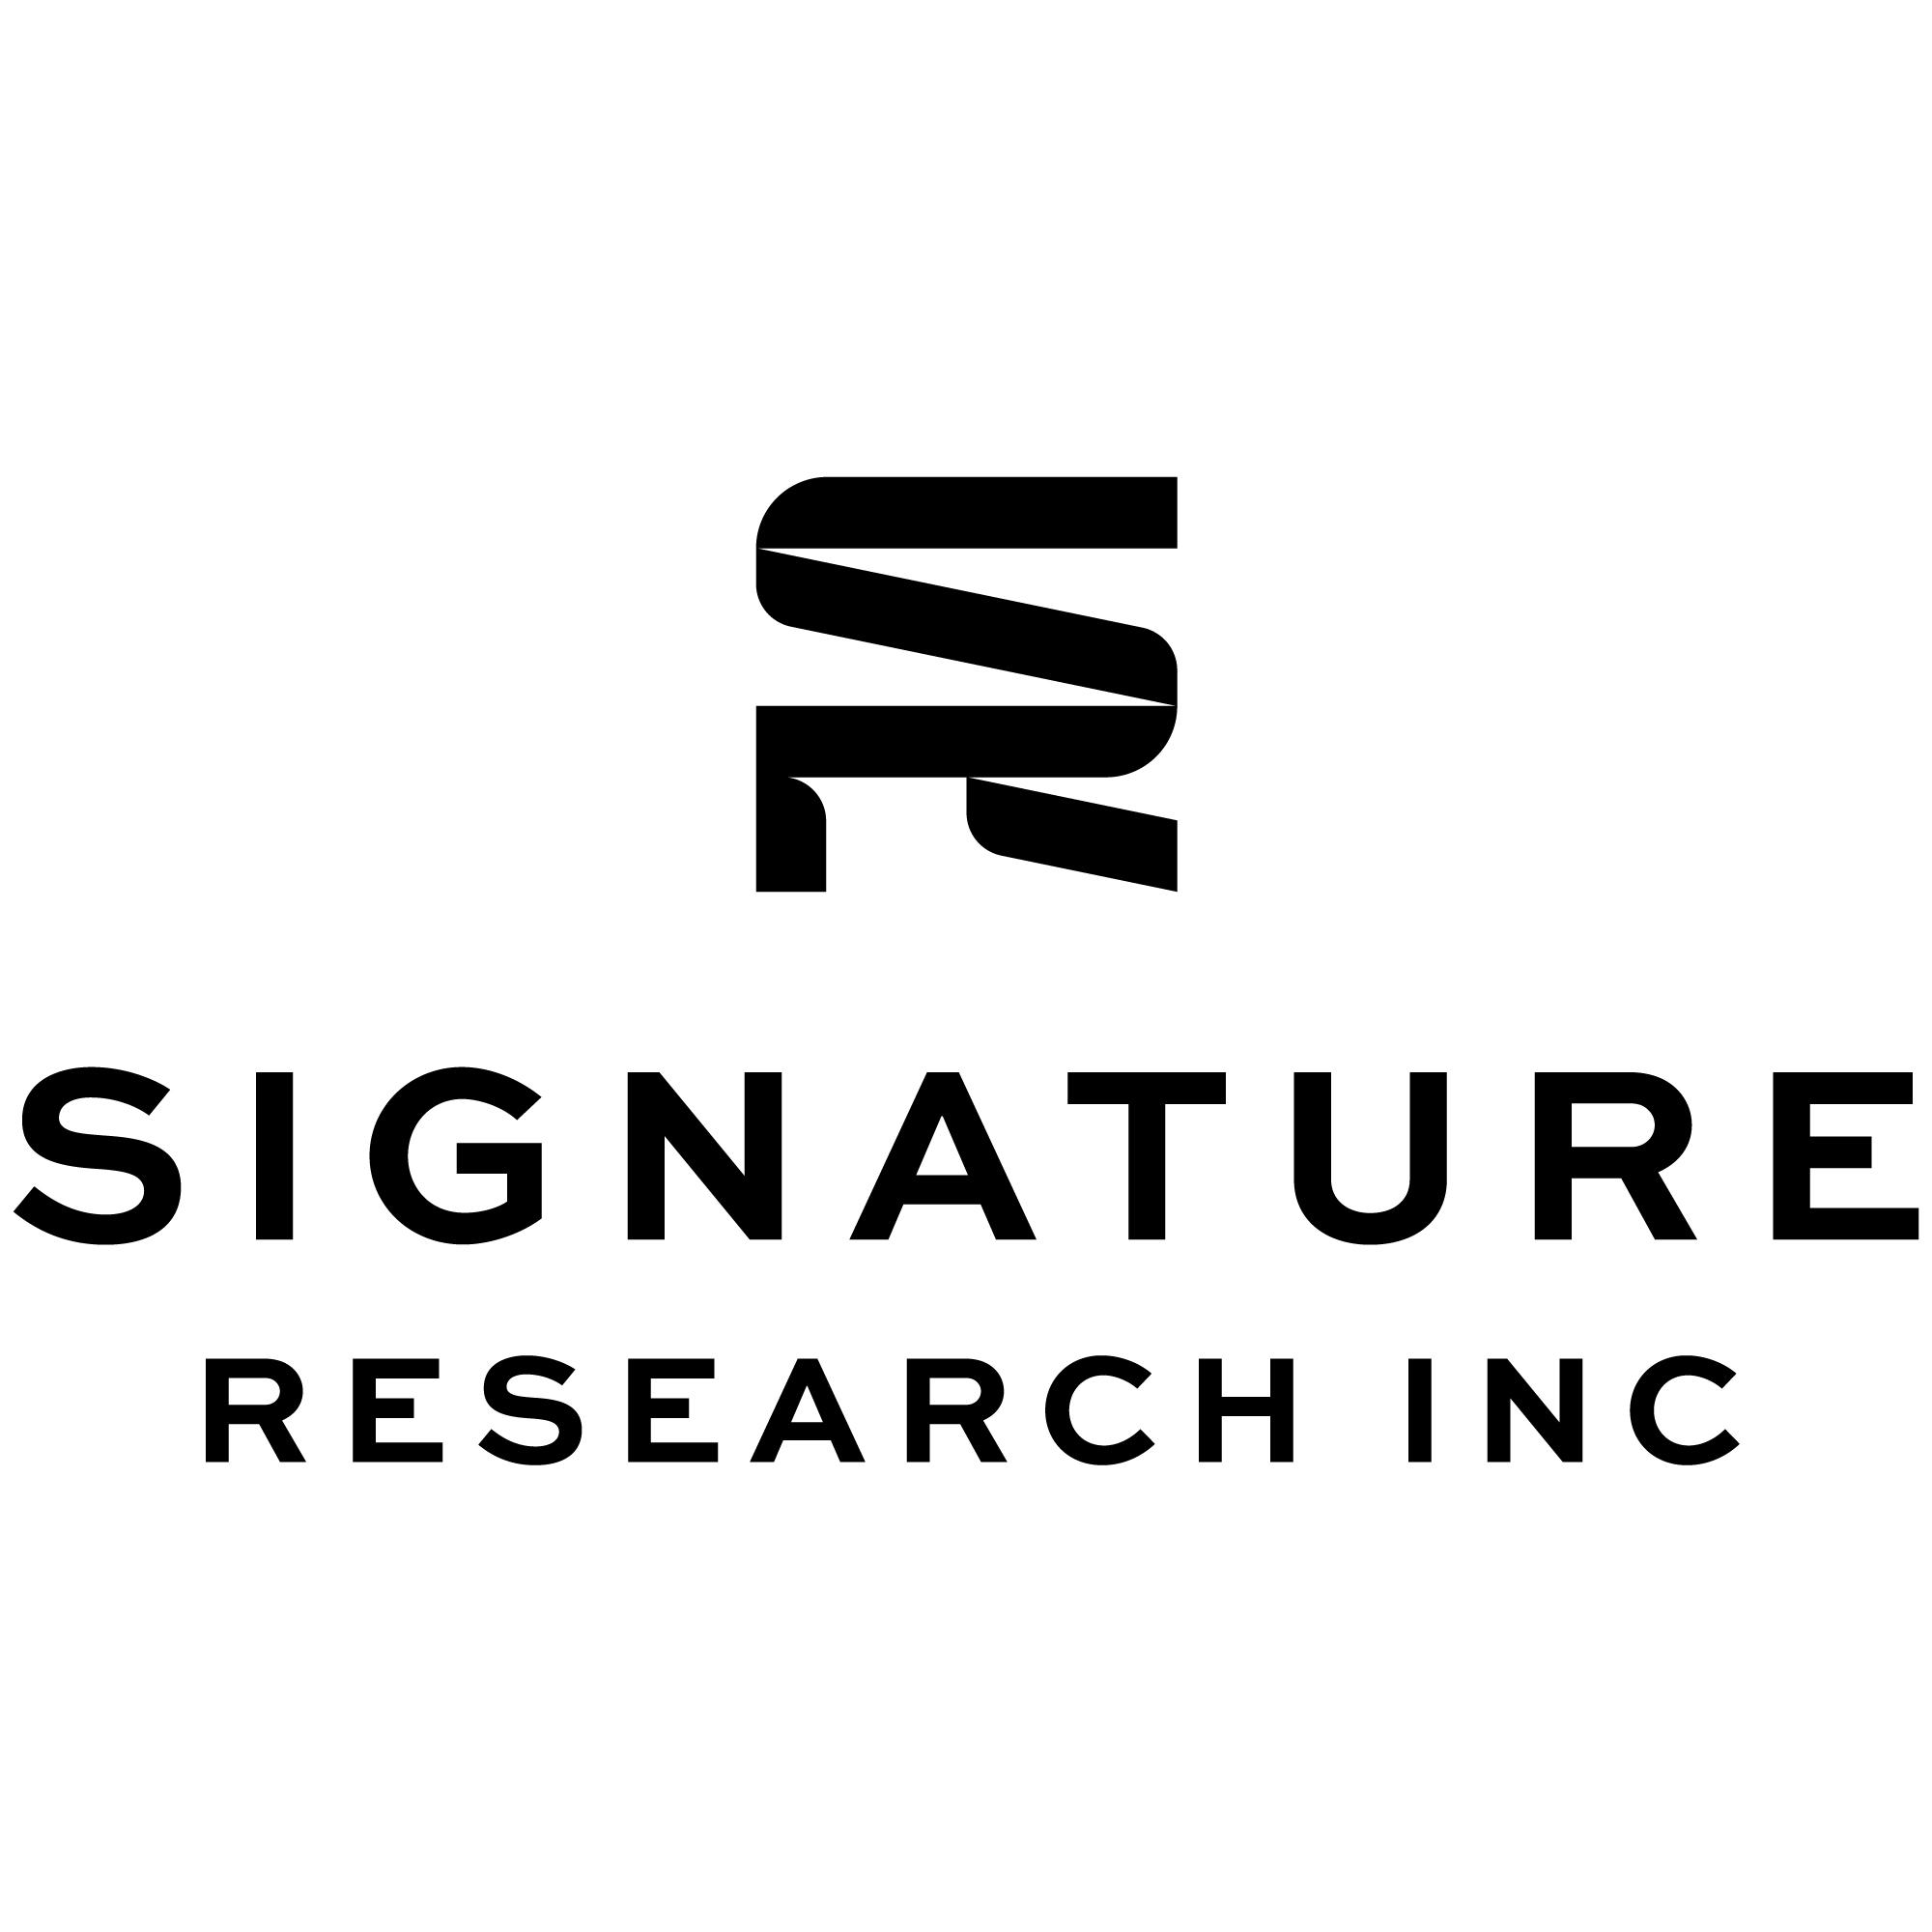 Signature Research, Inc.